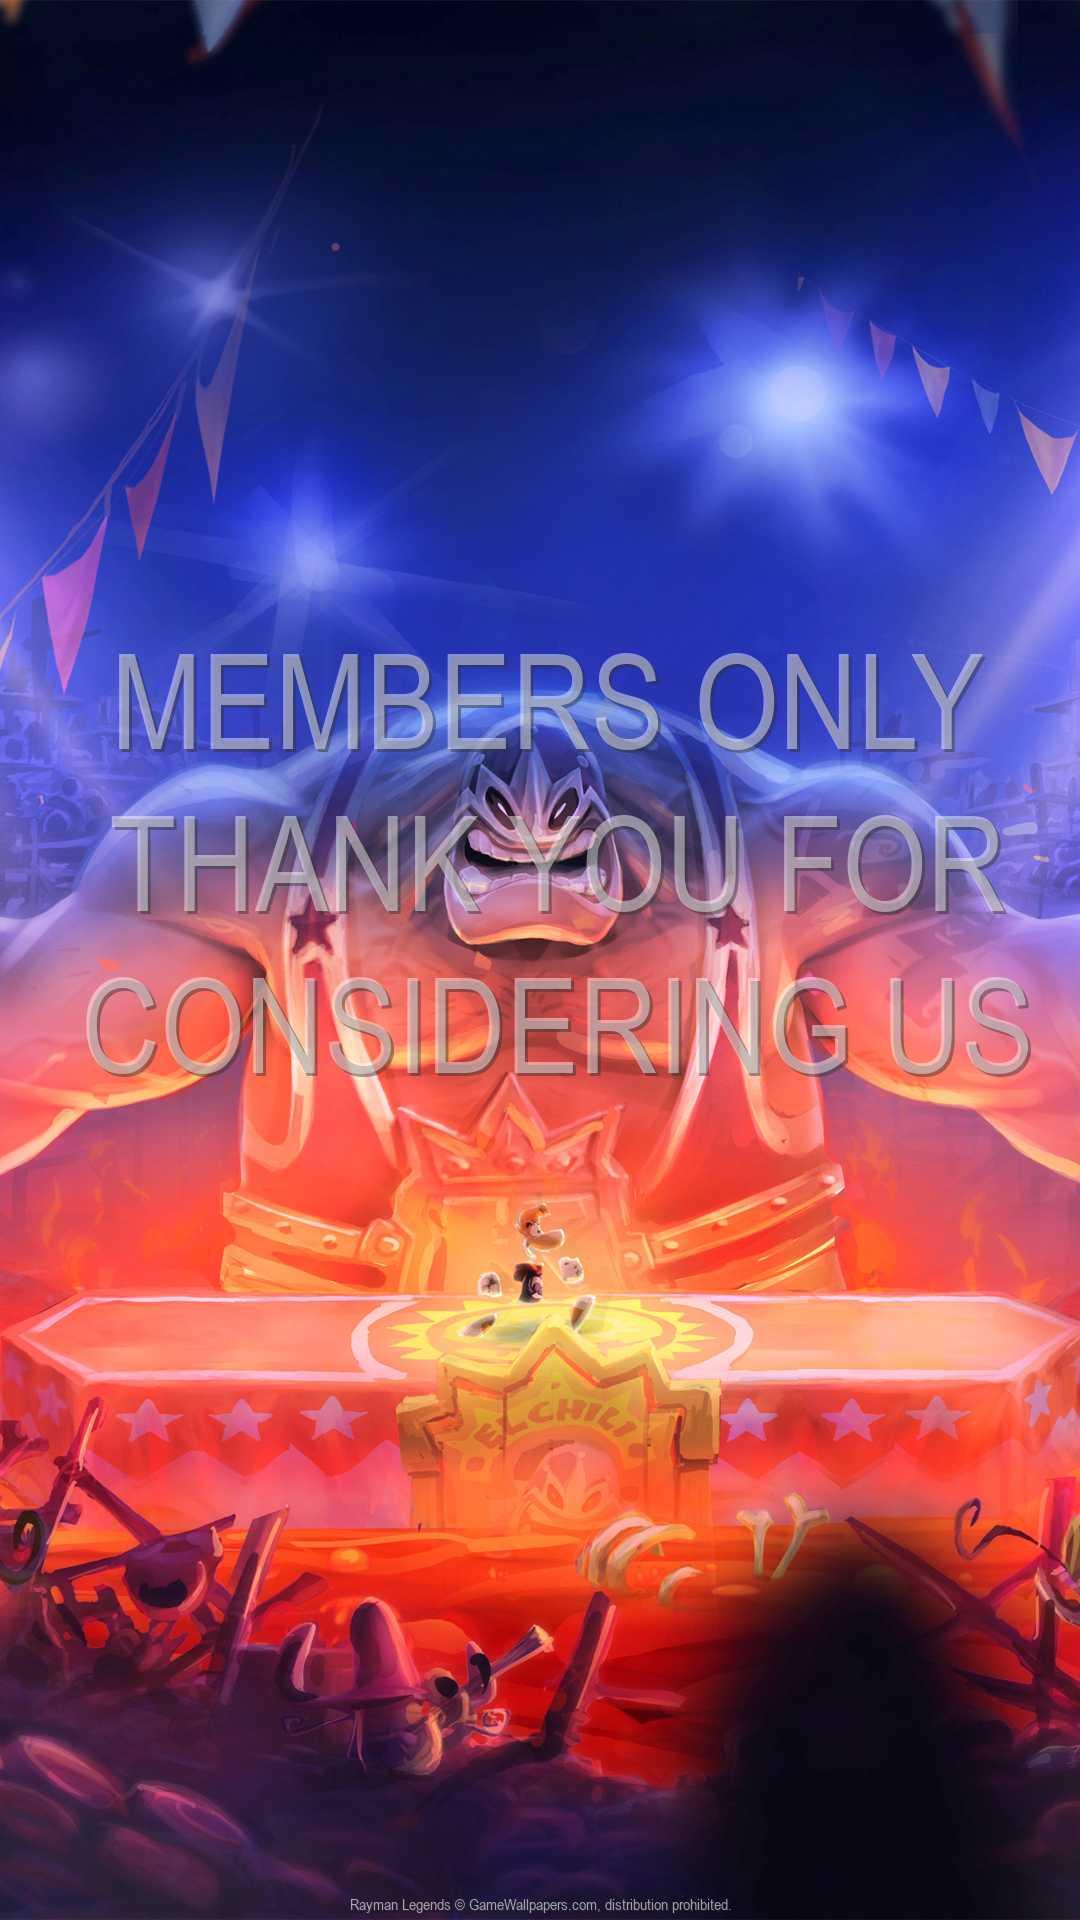 Rayman Legends 1080p Vertical Mobile wallpaper or background 01